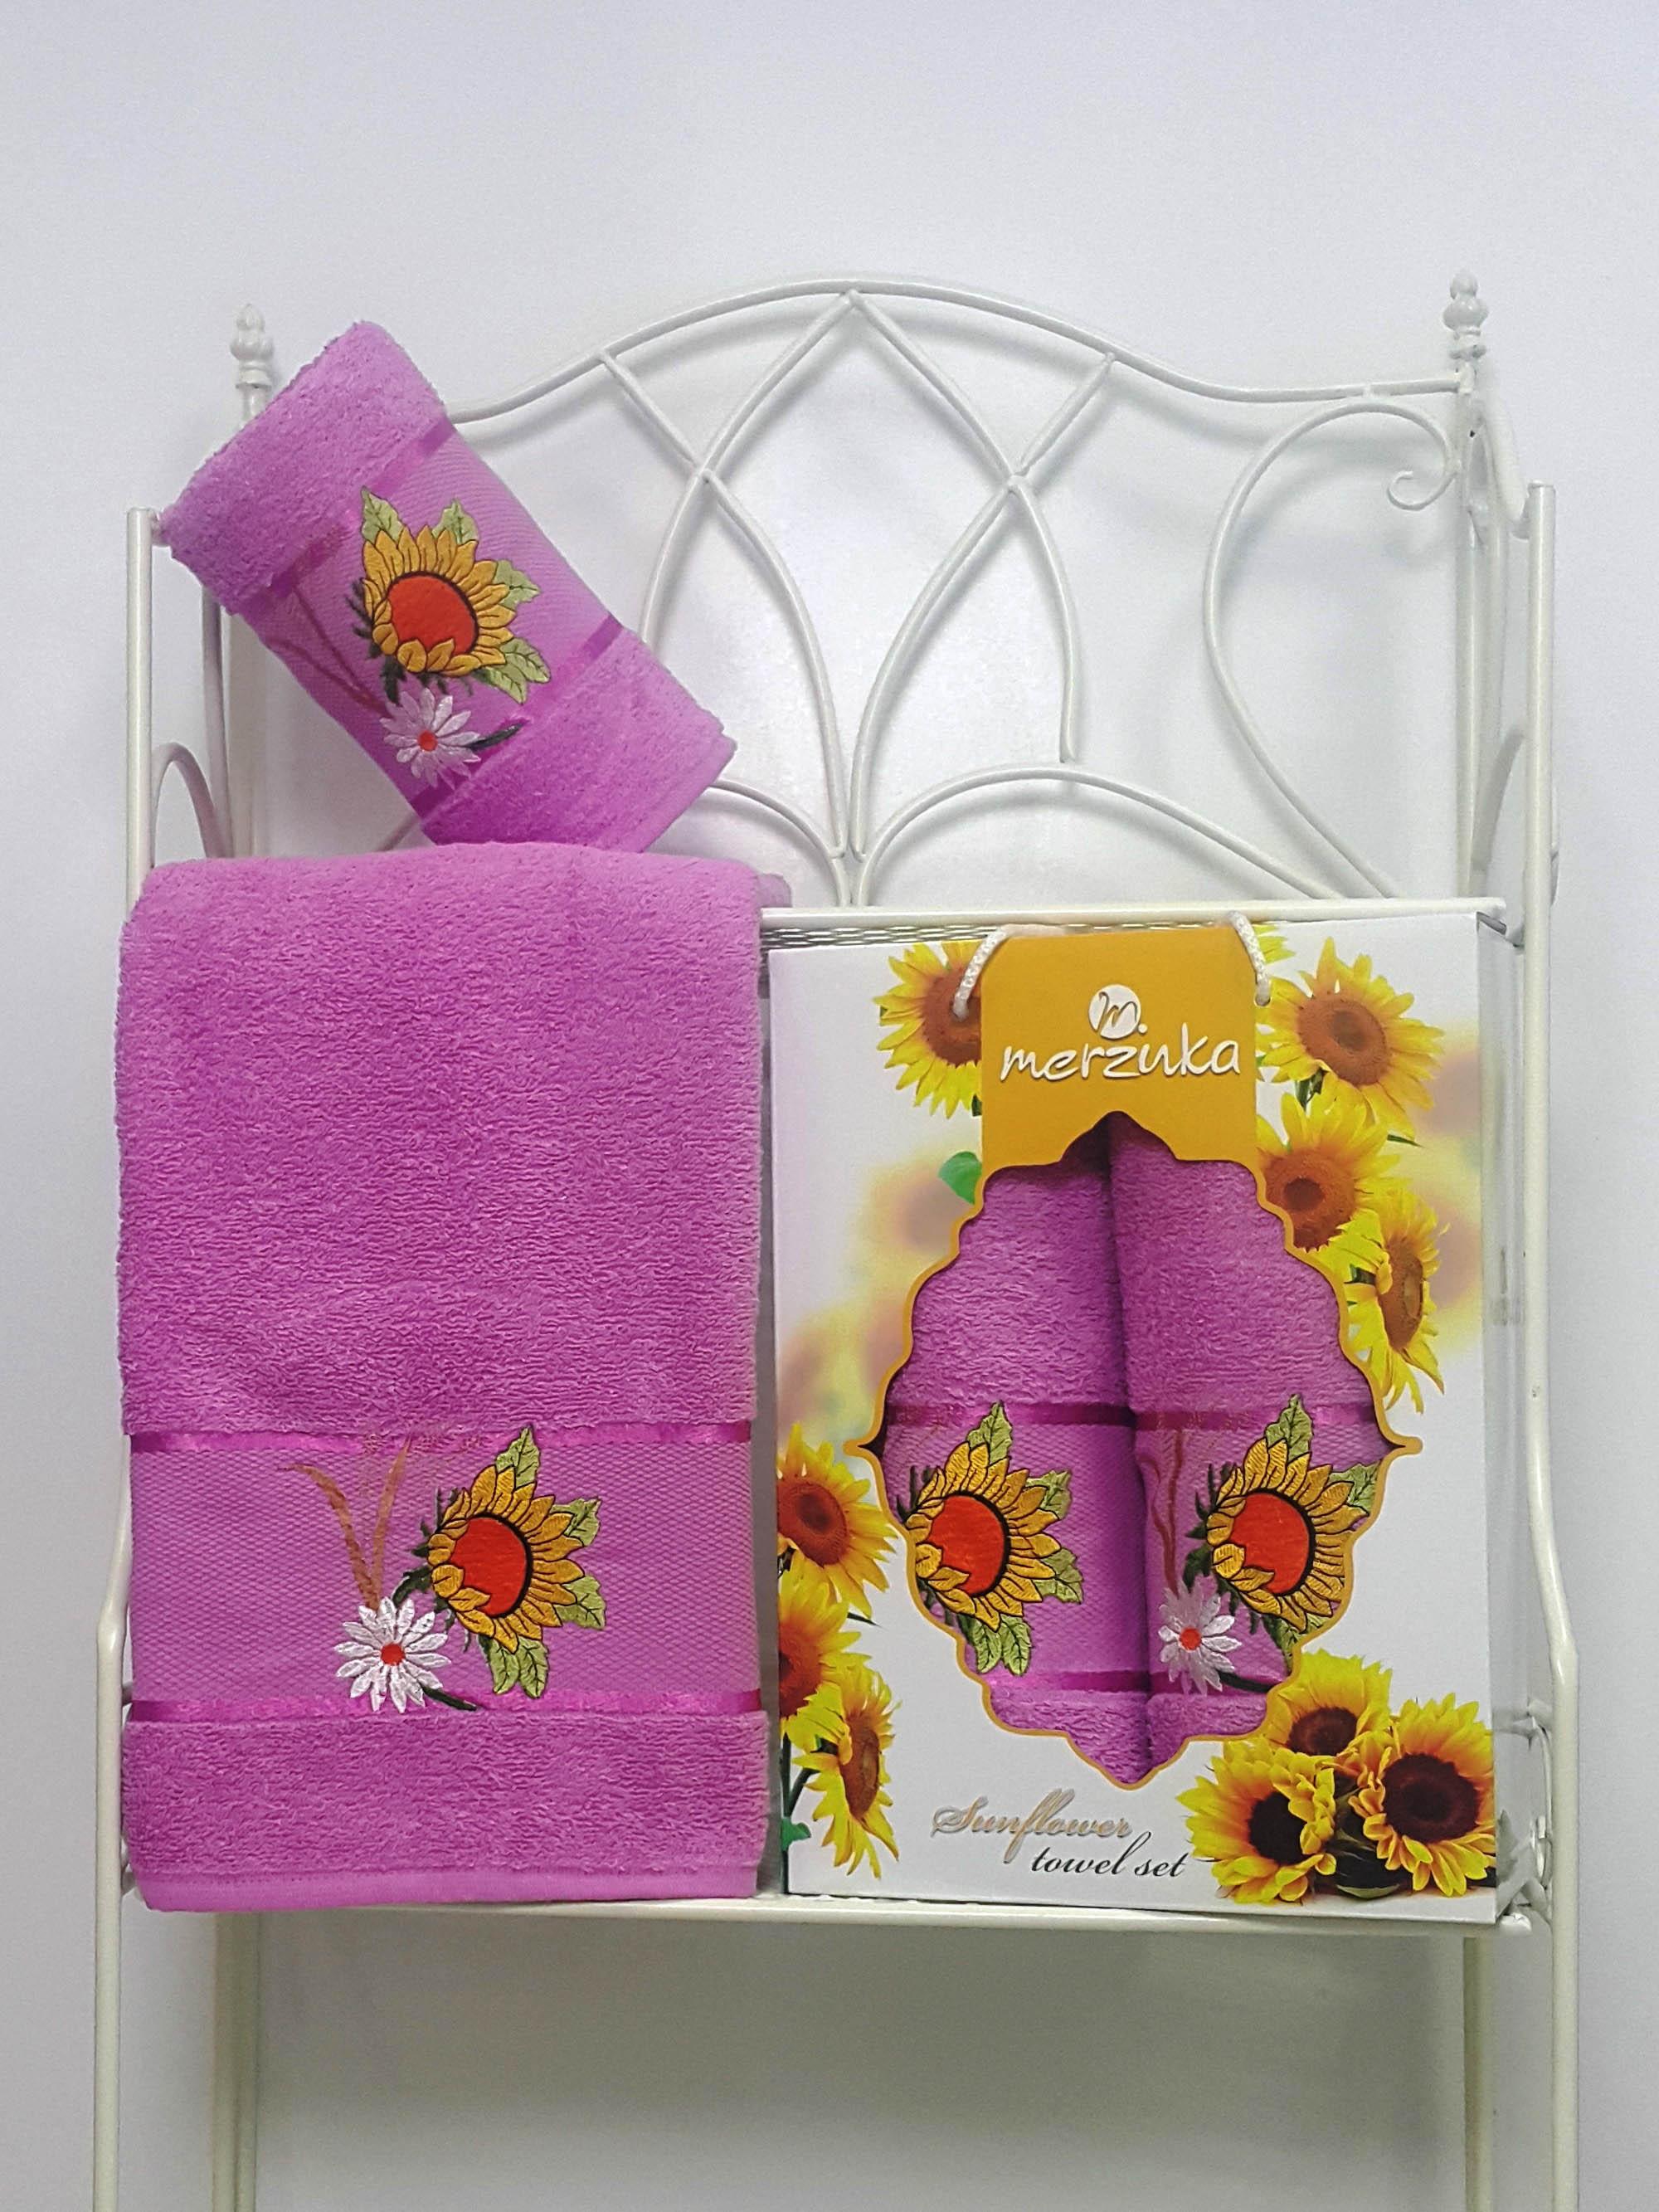 Полотенца Oran Merzuka Набор из 2 полотенец Sunflower Цвет: Светло-Лиловый набор из 2 полотенец merzuka sakura 50х90 70х140 8430 кремовый